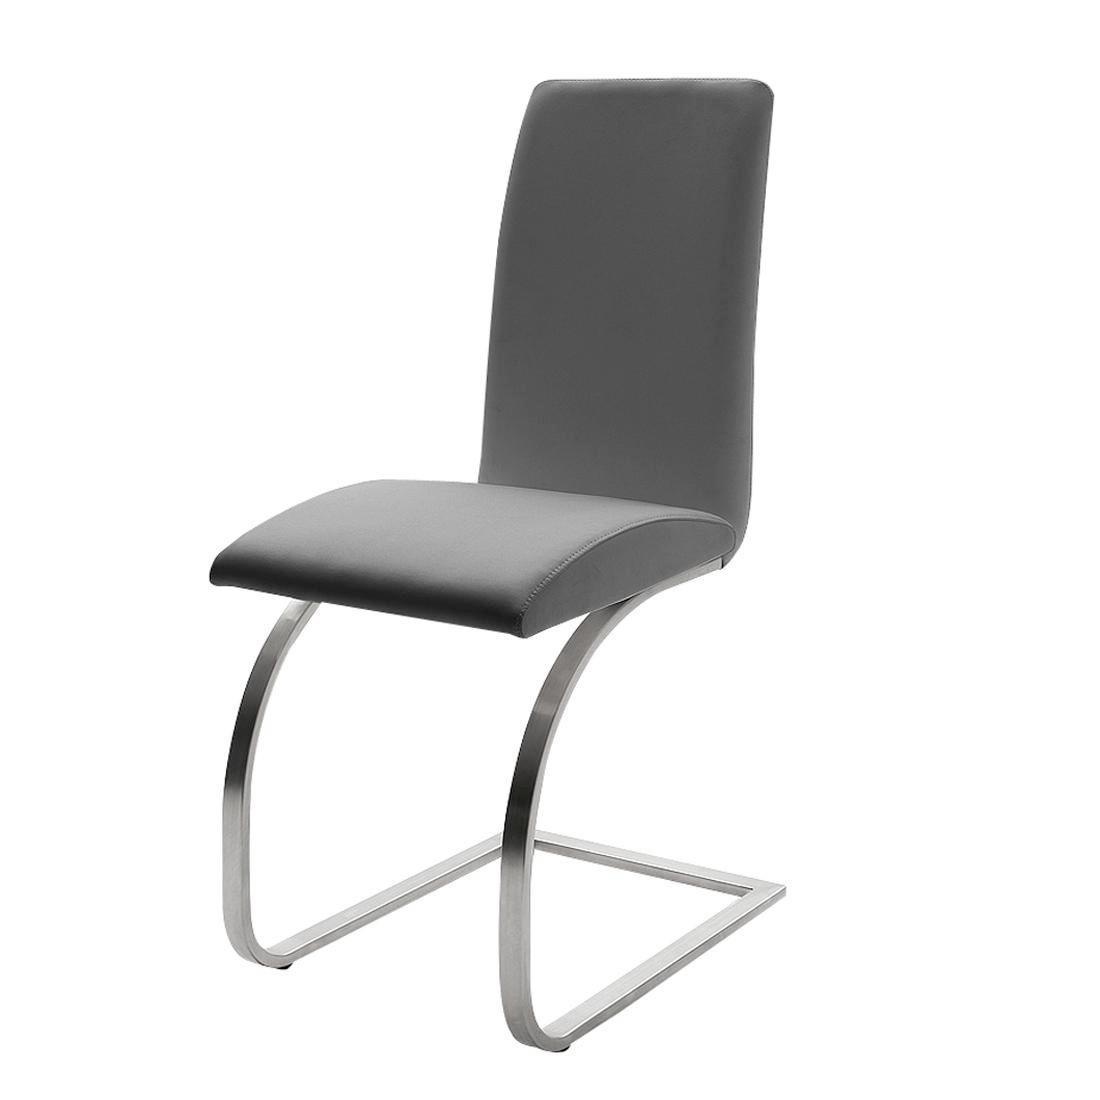 SCHWINGSTUHL Edelstahlfarben, Grau - Edelstahlfarben/Grau, Design, Textil/Metall (43/97/58cm) - NOVEL